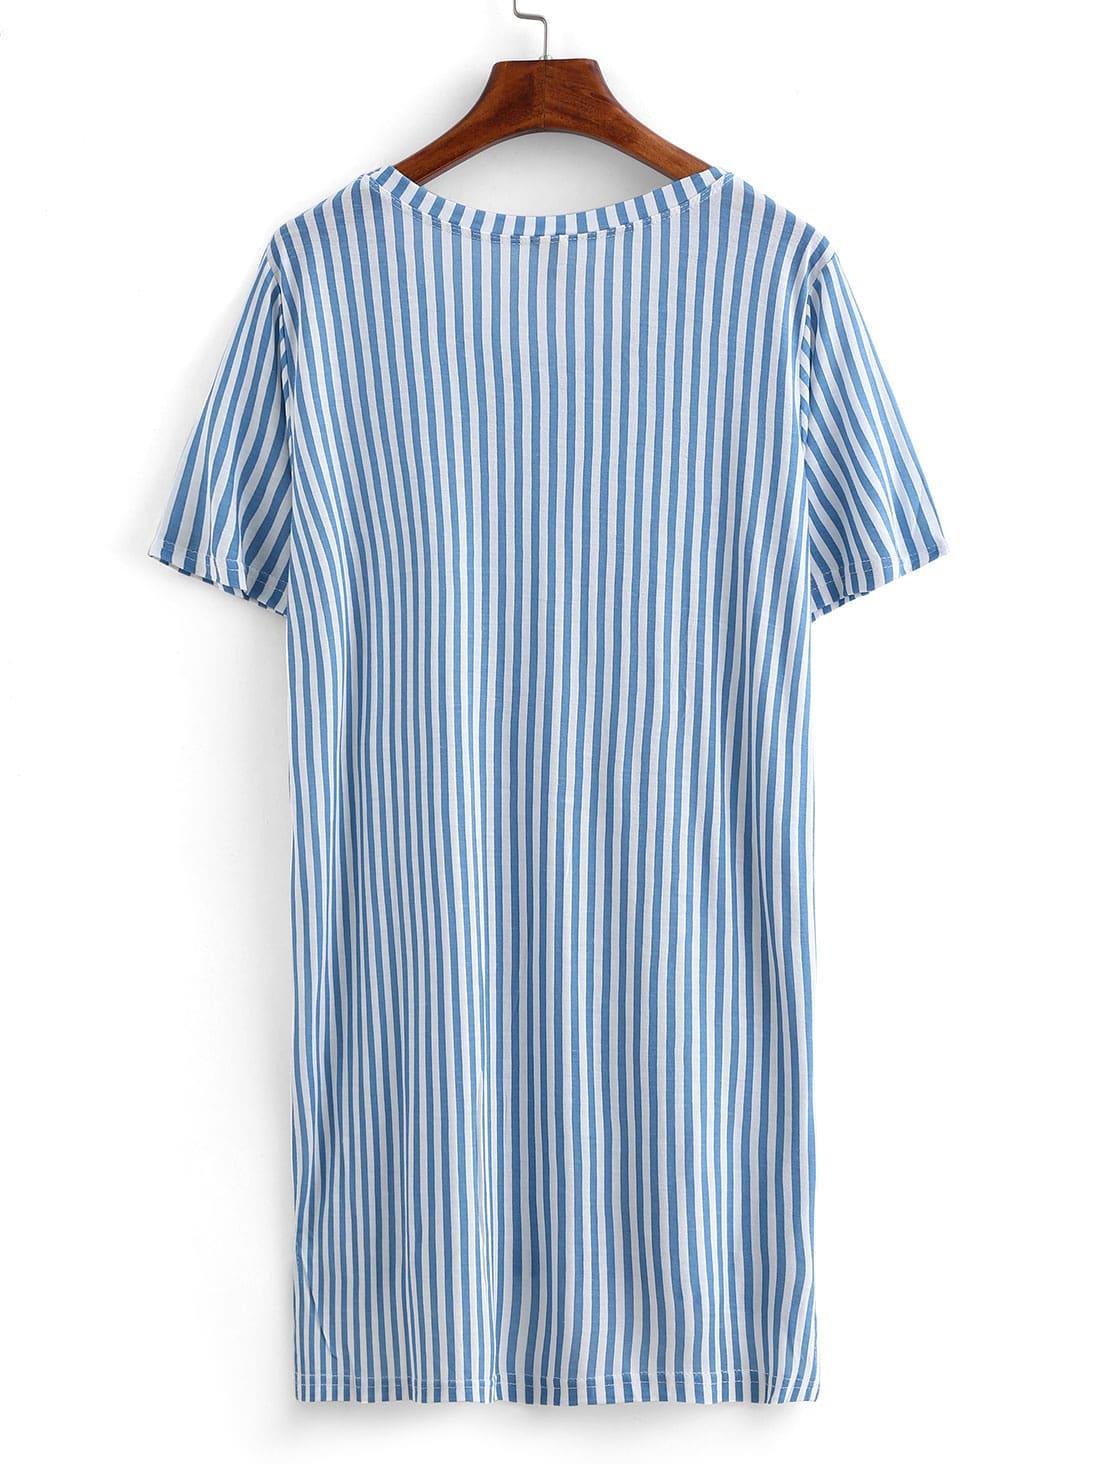 Vertical Striped High-Low T-shirt -SheIn(Sheinside)